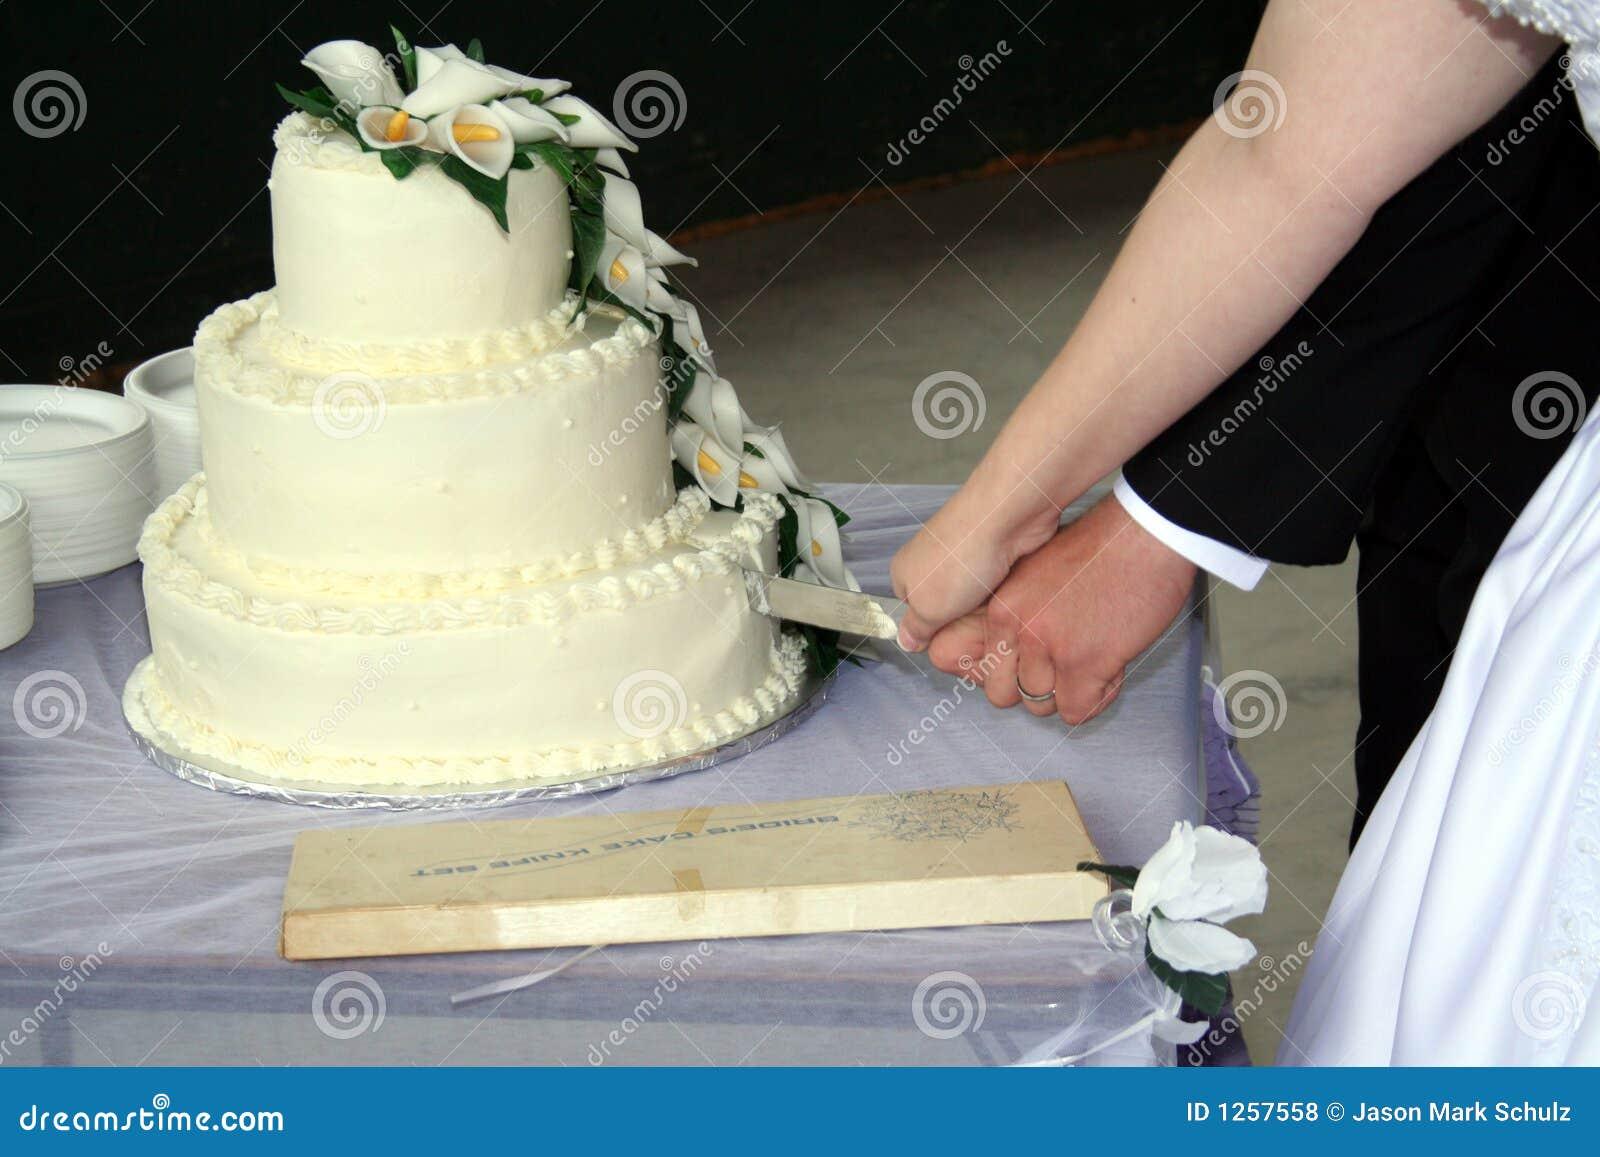 Bride And Groom Cutting Wedding Cake Royalty Free Stock Photos Image